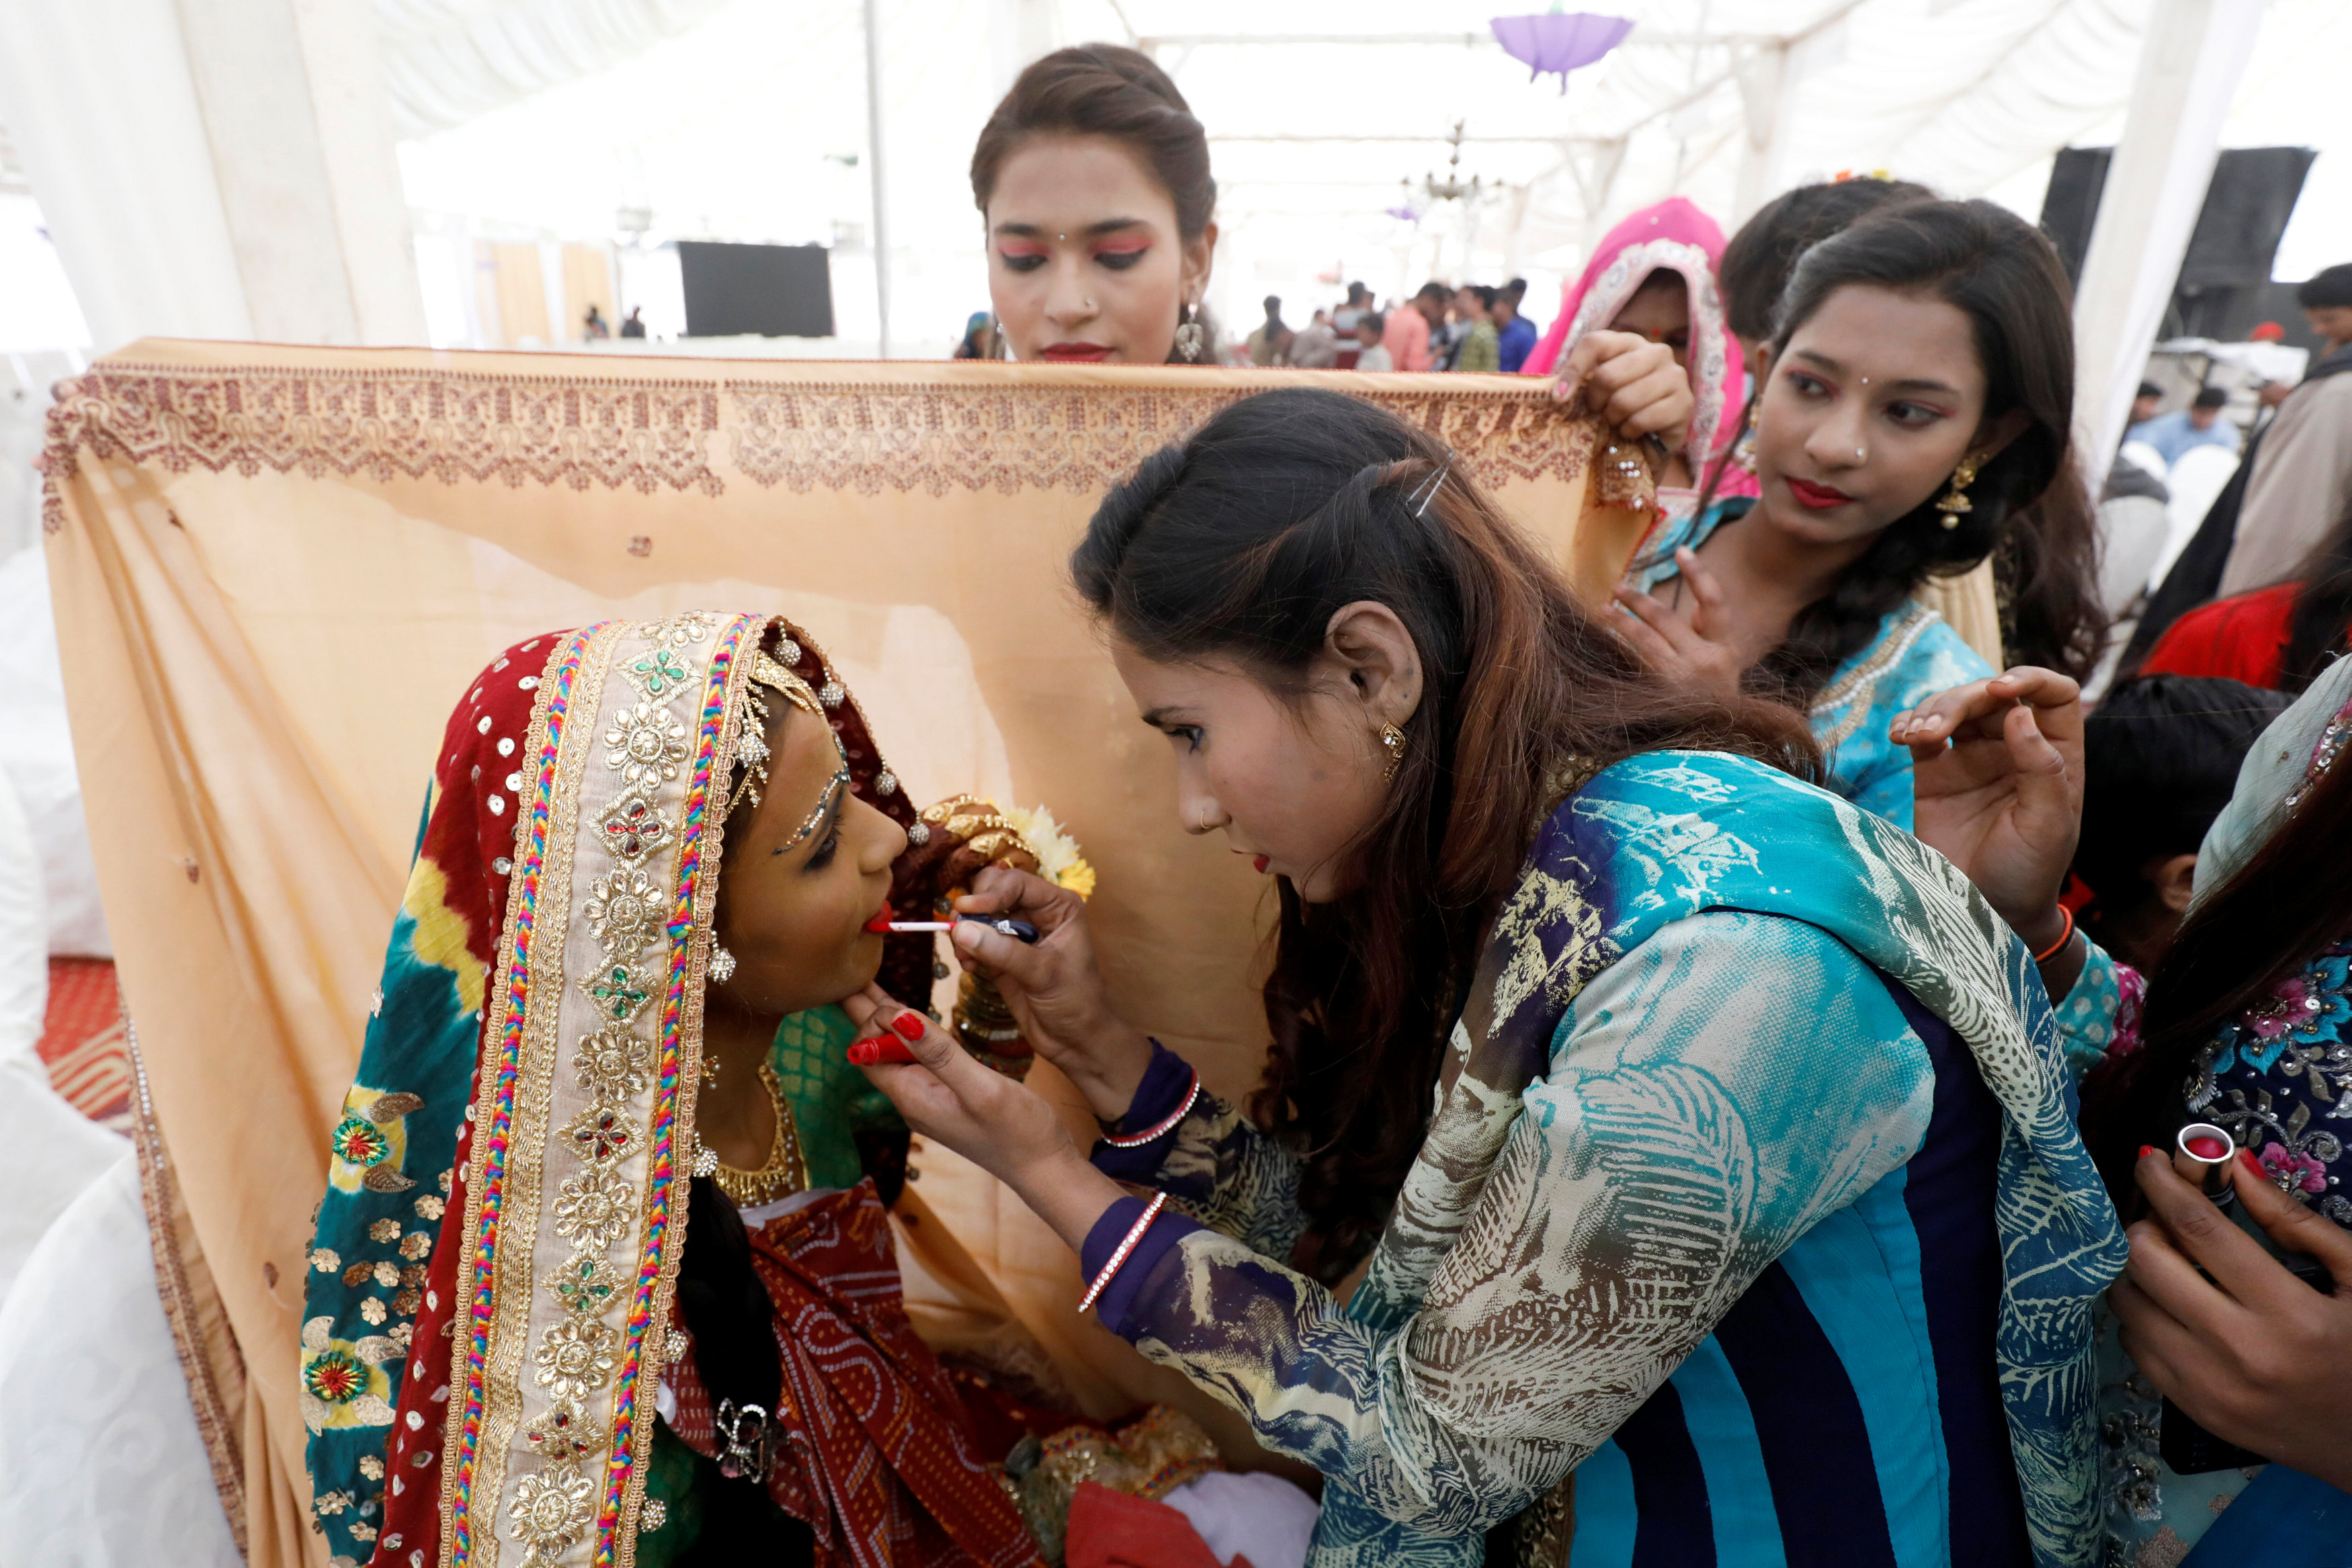 حفل زفاف جماعى للهندوس فى كراتشى (4)